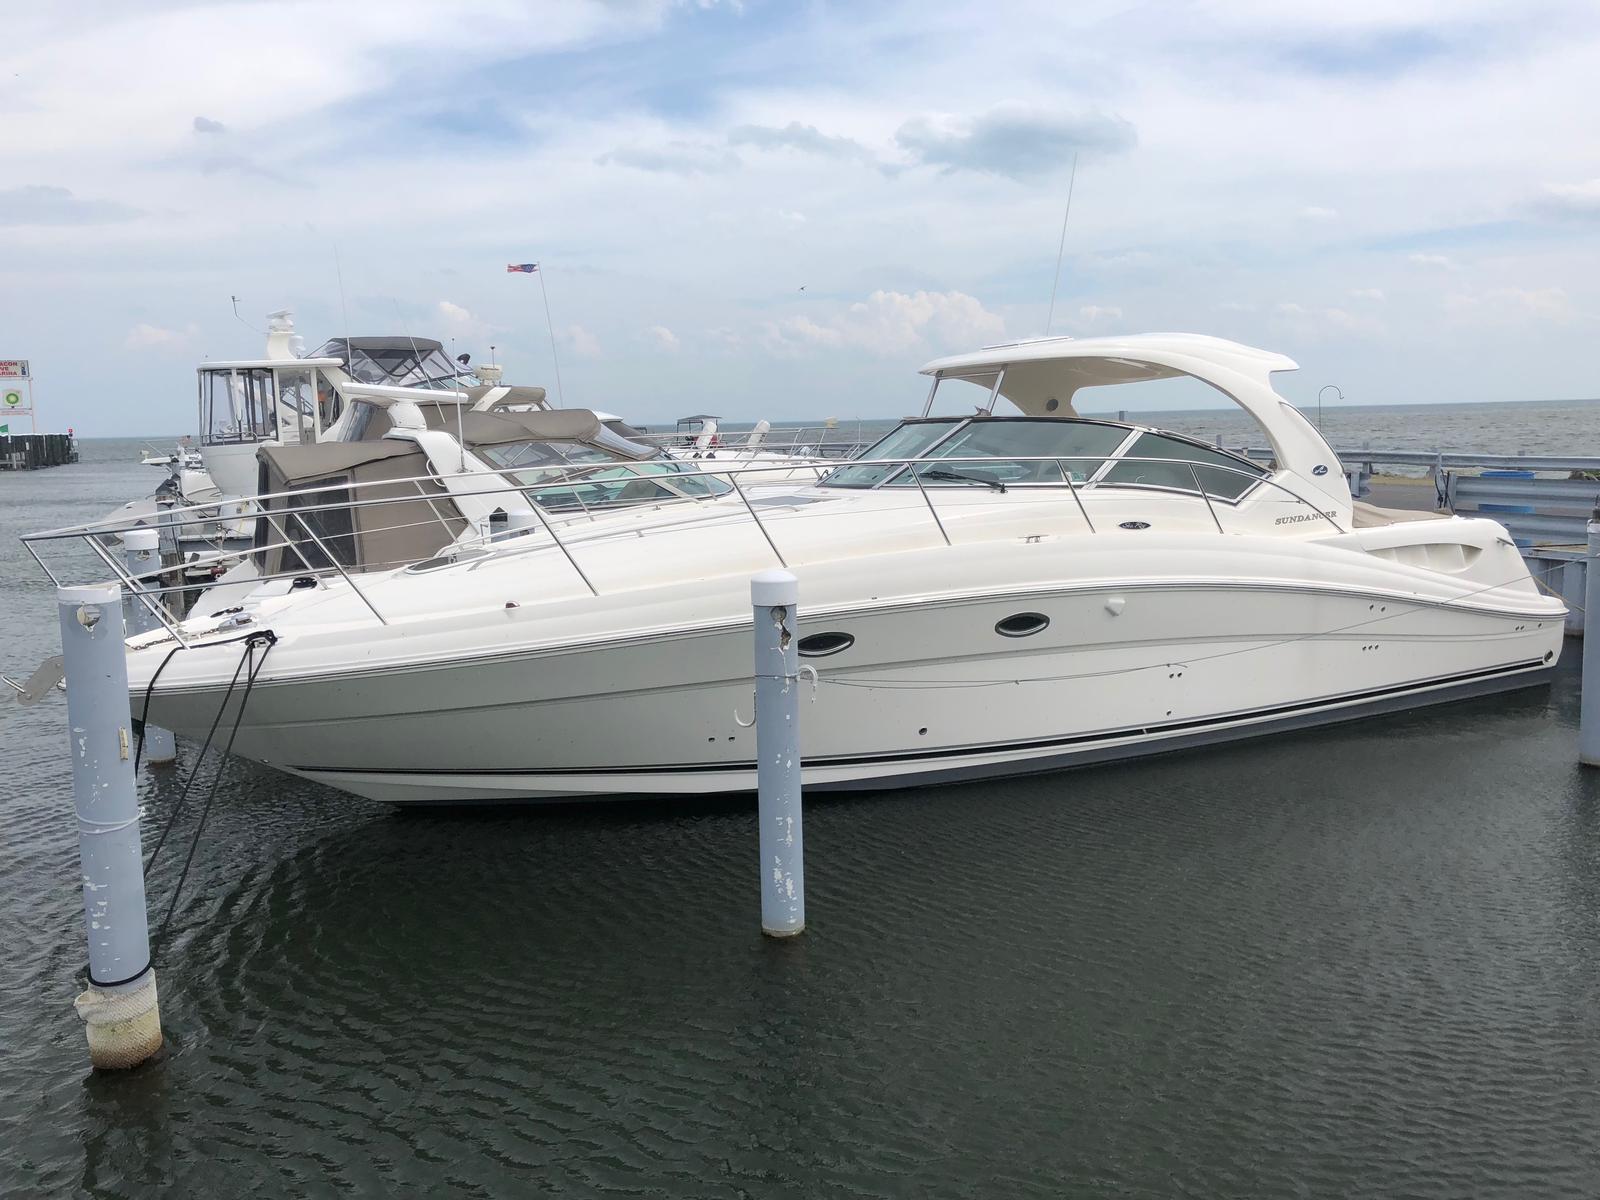 2005 Sea Ray 390 Sundancer® for sale in Harrison Township, MI | Hideaway Harbor & Yacht Sales (586 493-9900